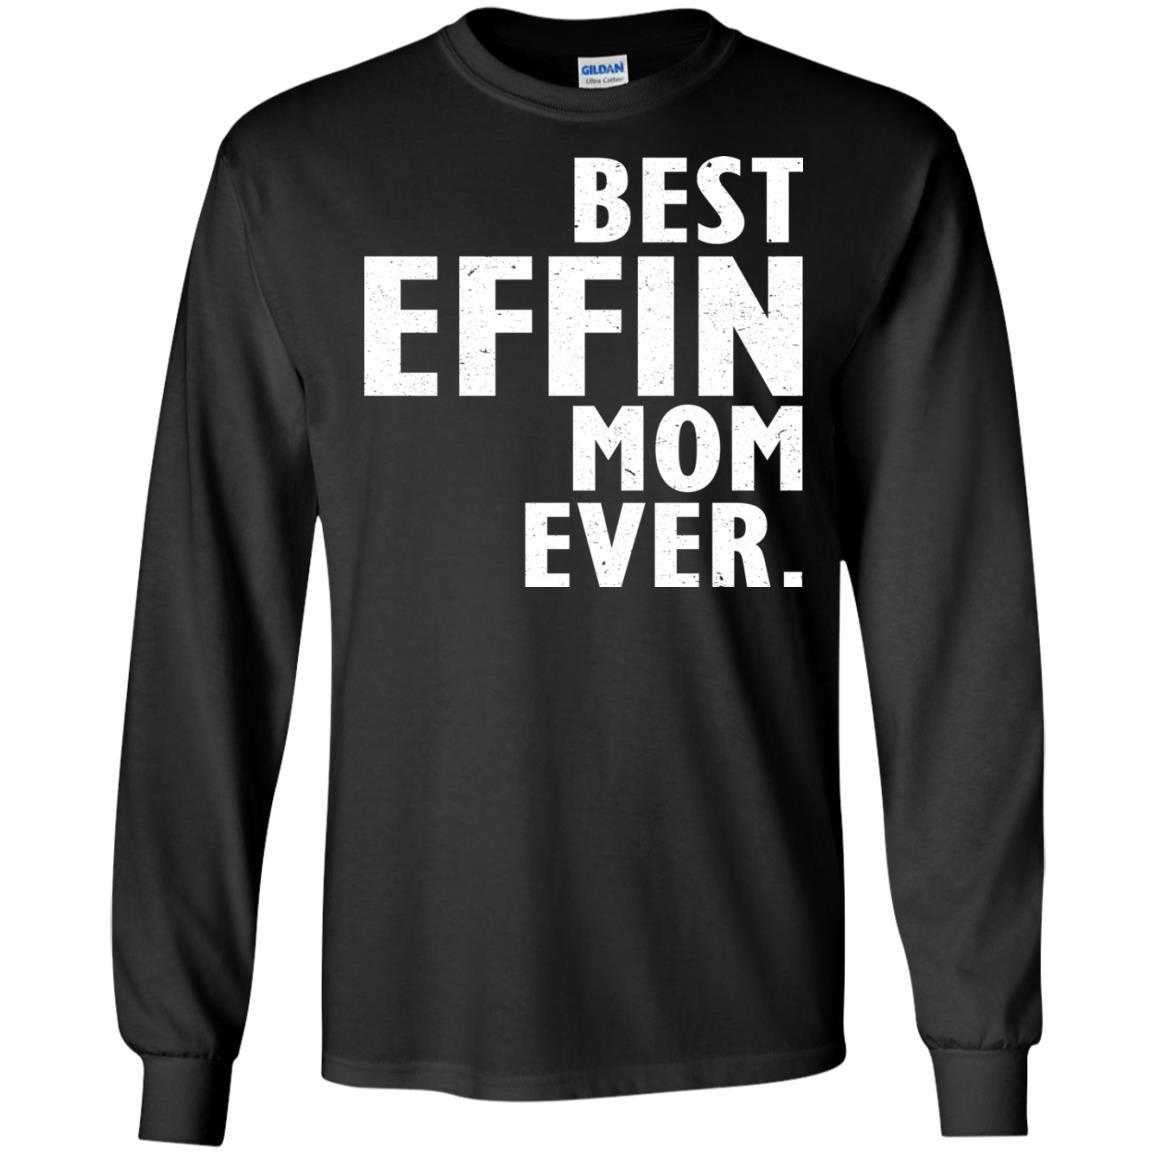 image 372 - Best Effin Mom Ever Shirt, Sweatshirt, Hoodie